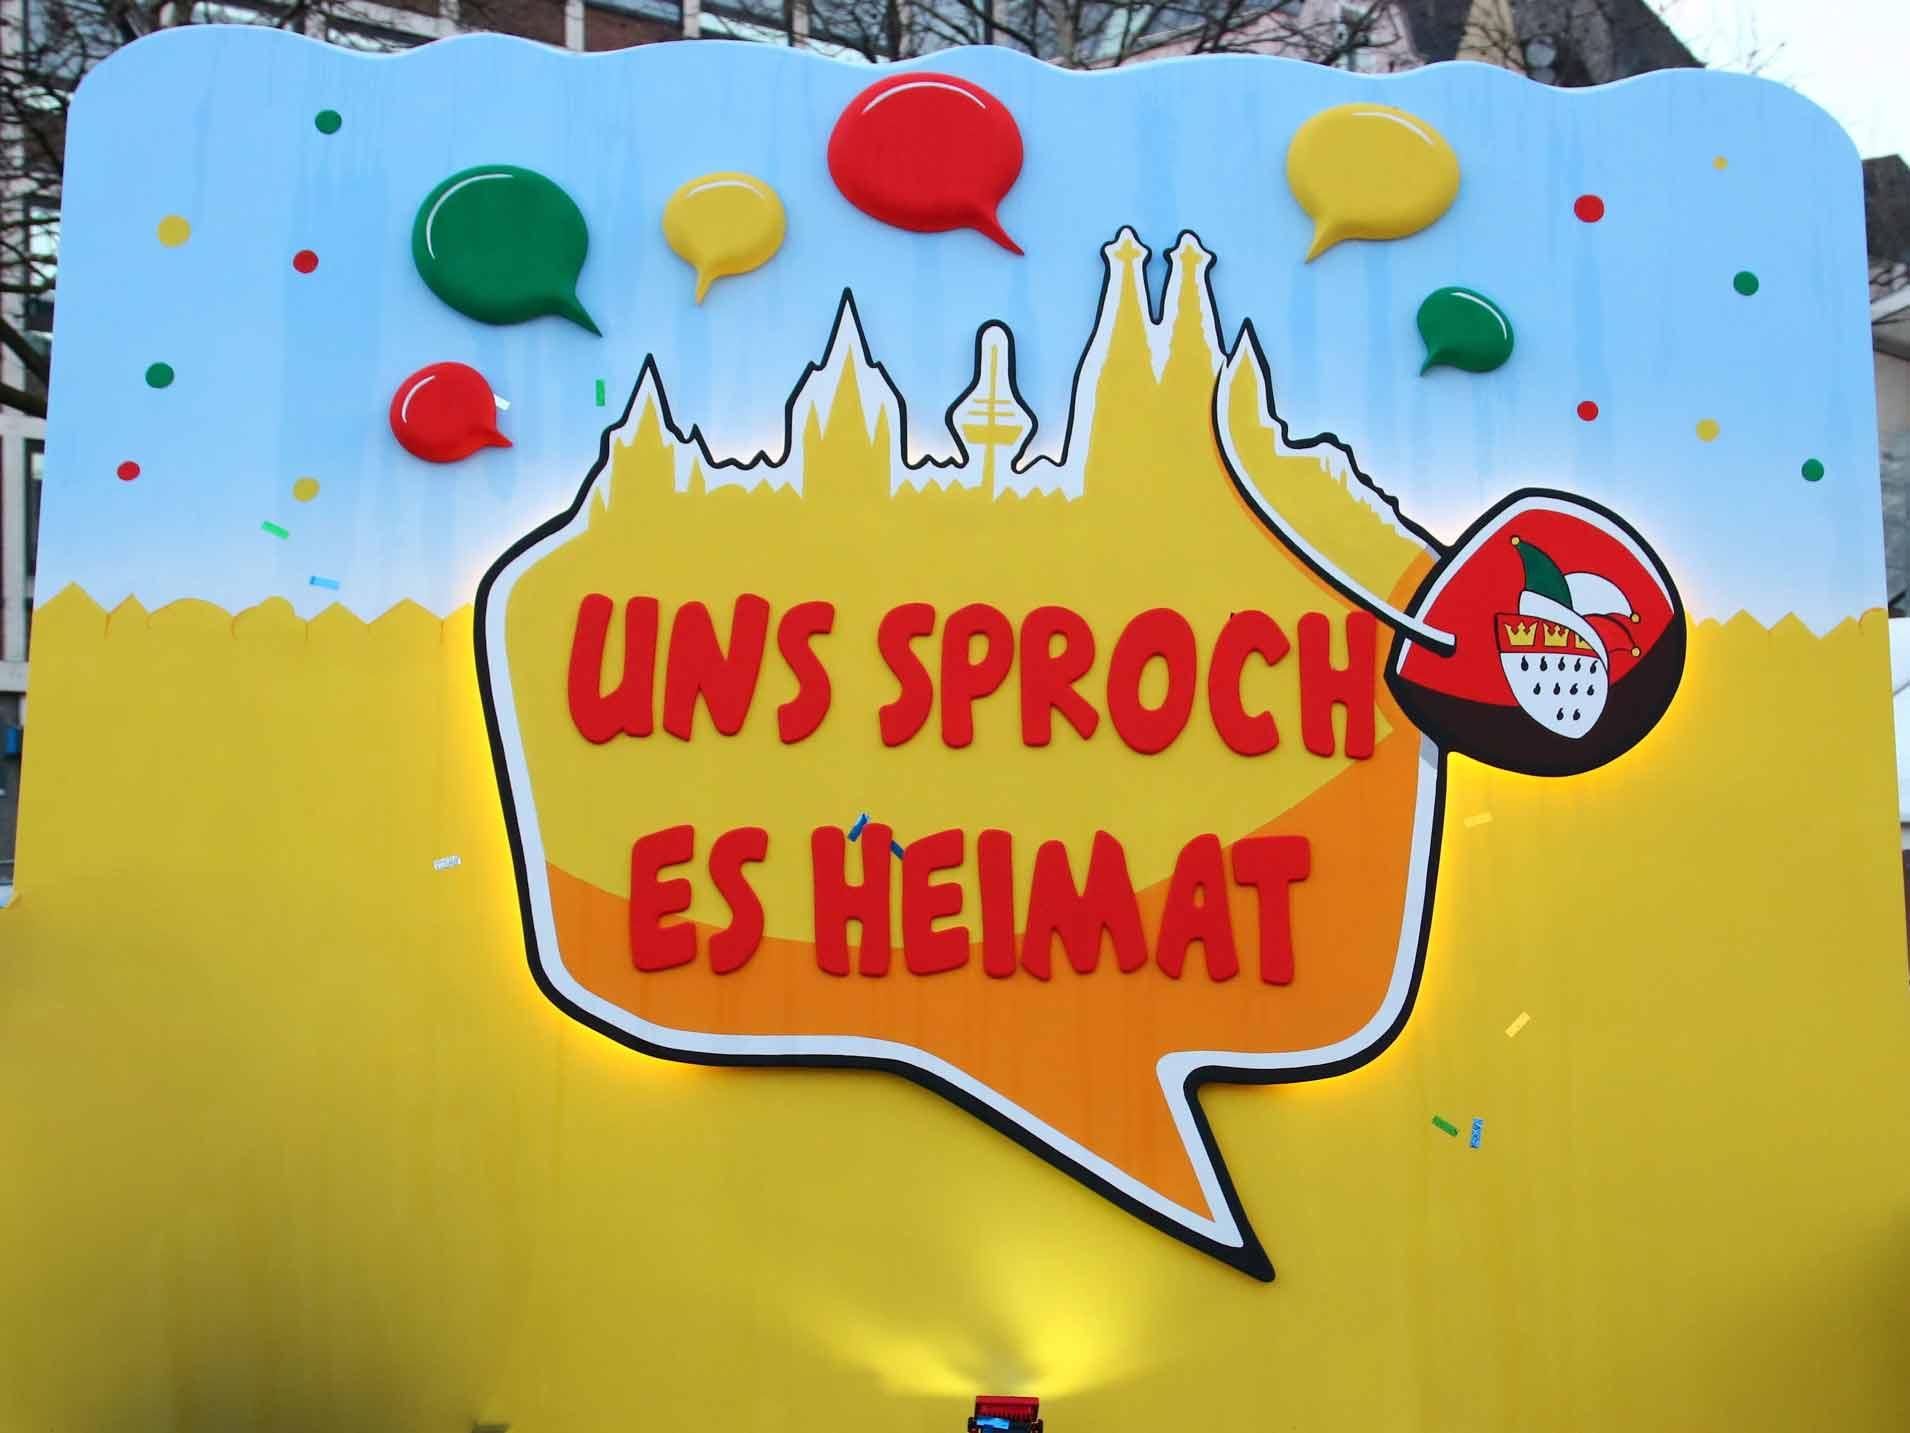 Das Karnevals-Motto 2019: Uns Sproch es Heimat copyright: CityNEWS / Thomas Pera